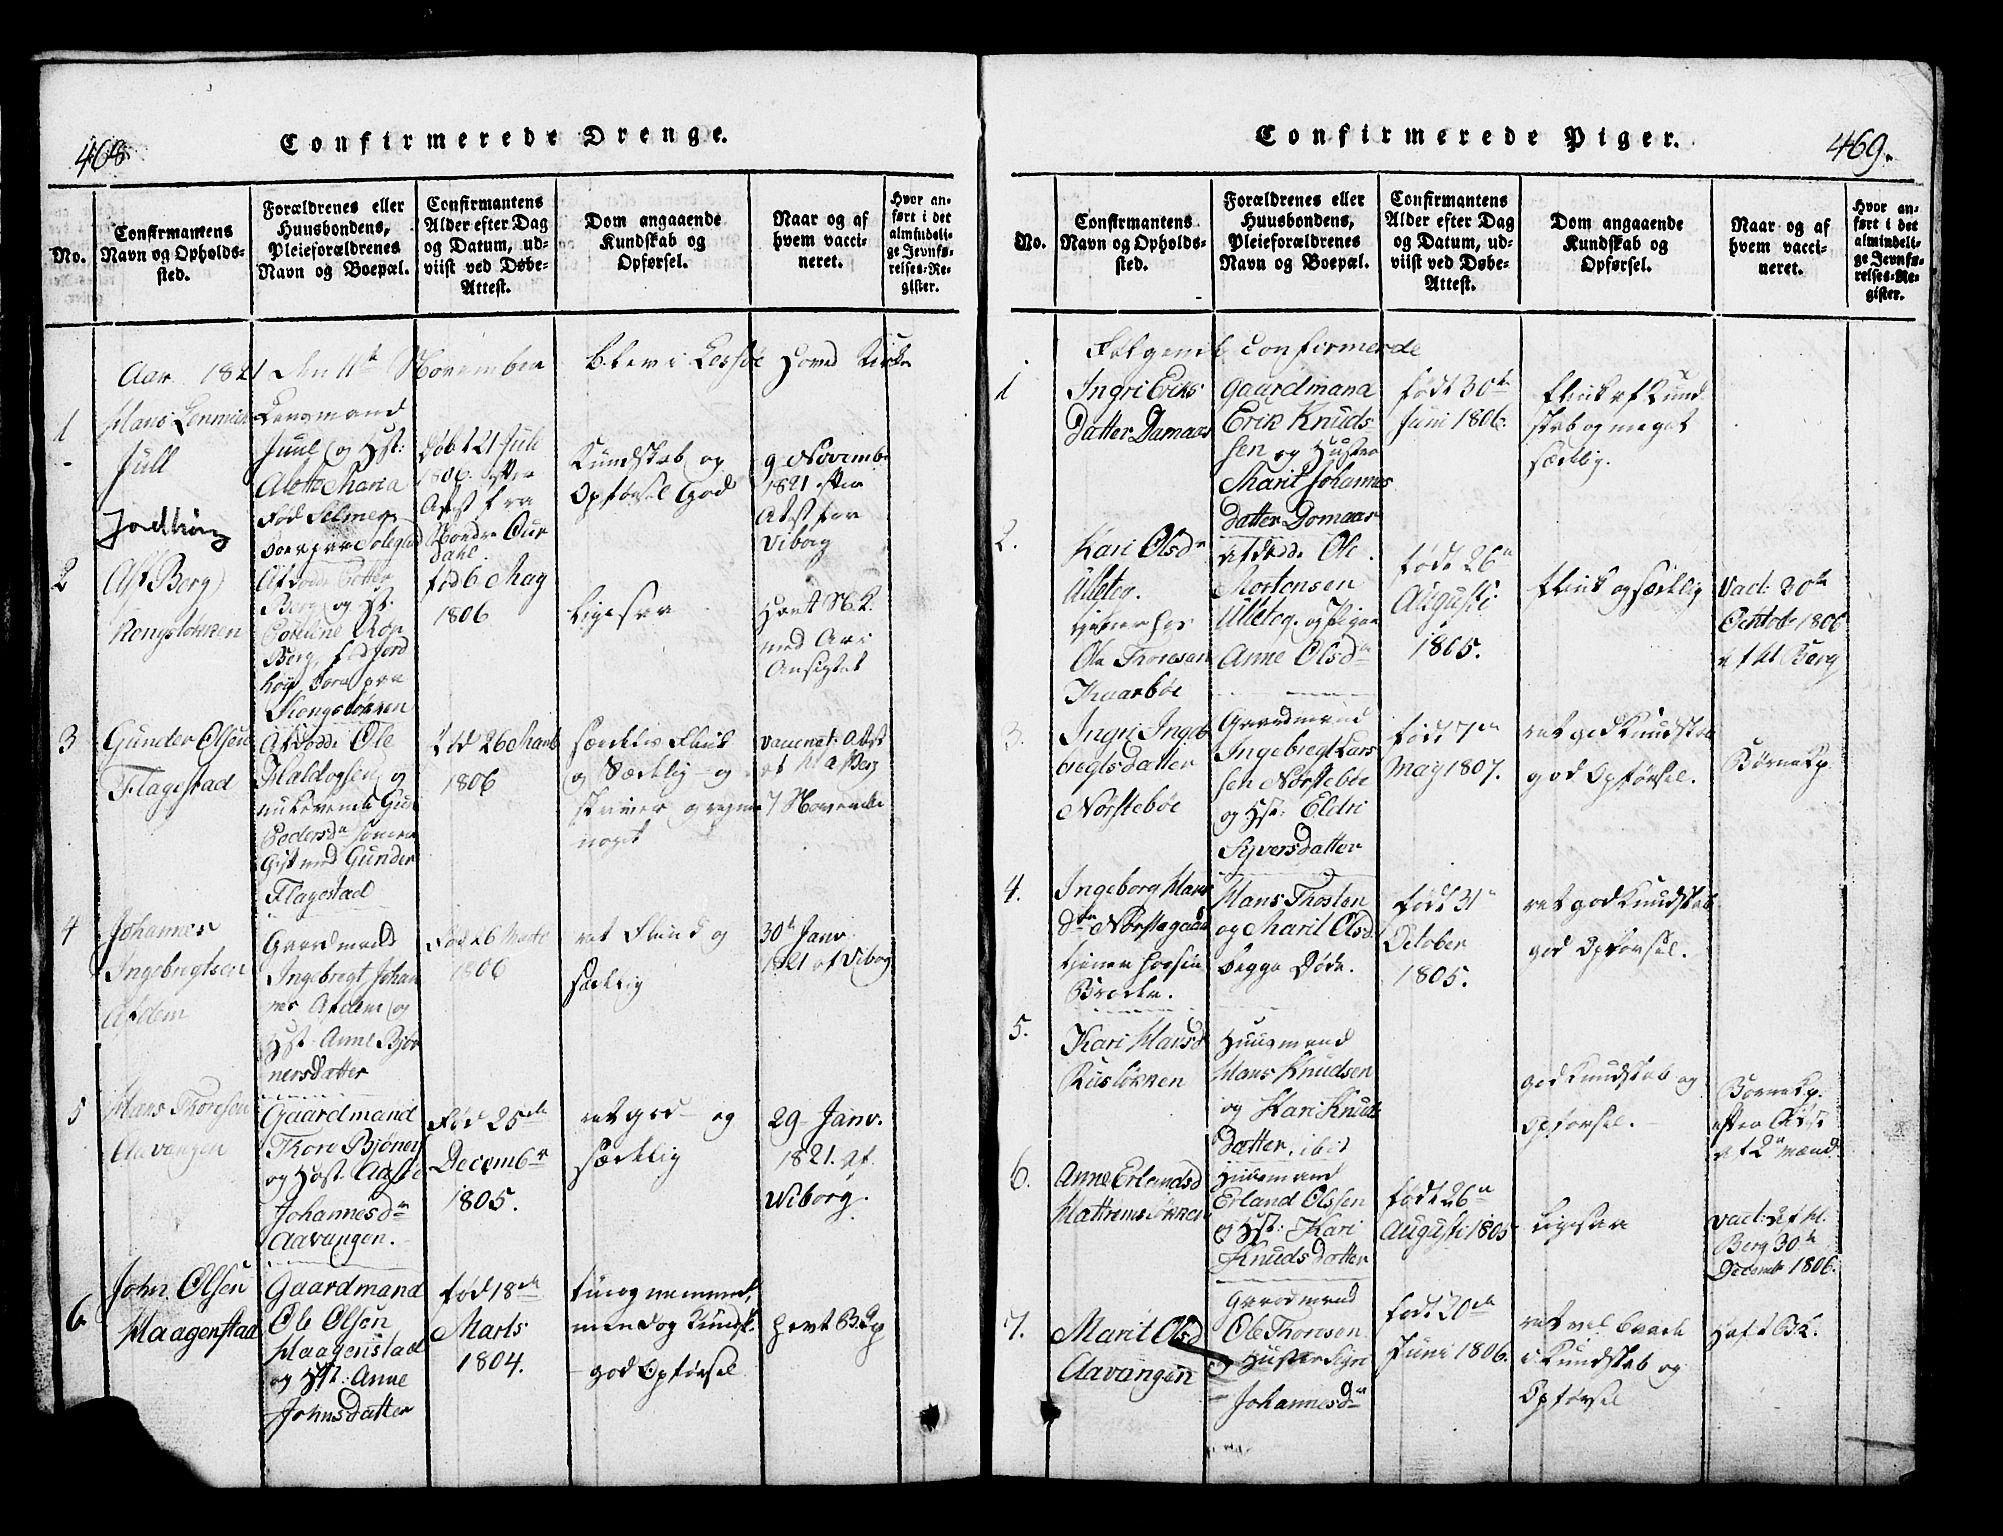 SAH, Lesja prestekontor, Klokkerbok nr. 1, 1820-1831, s. 468-469